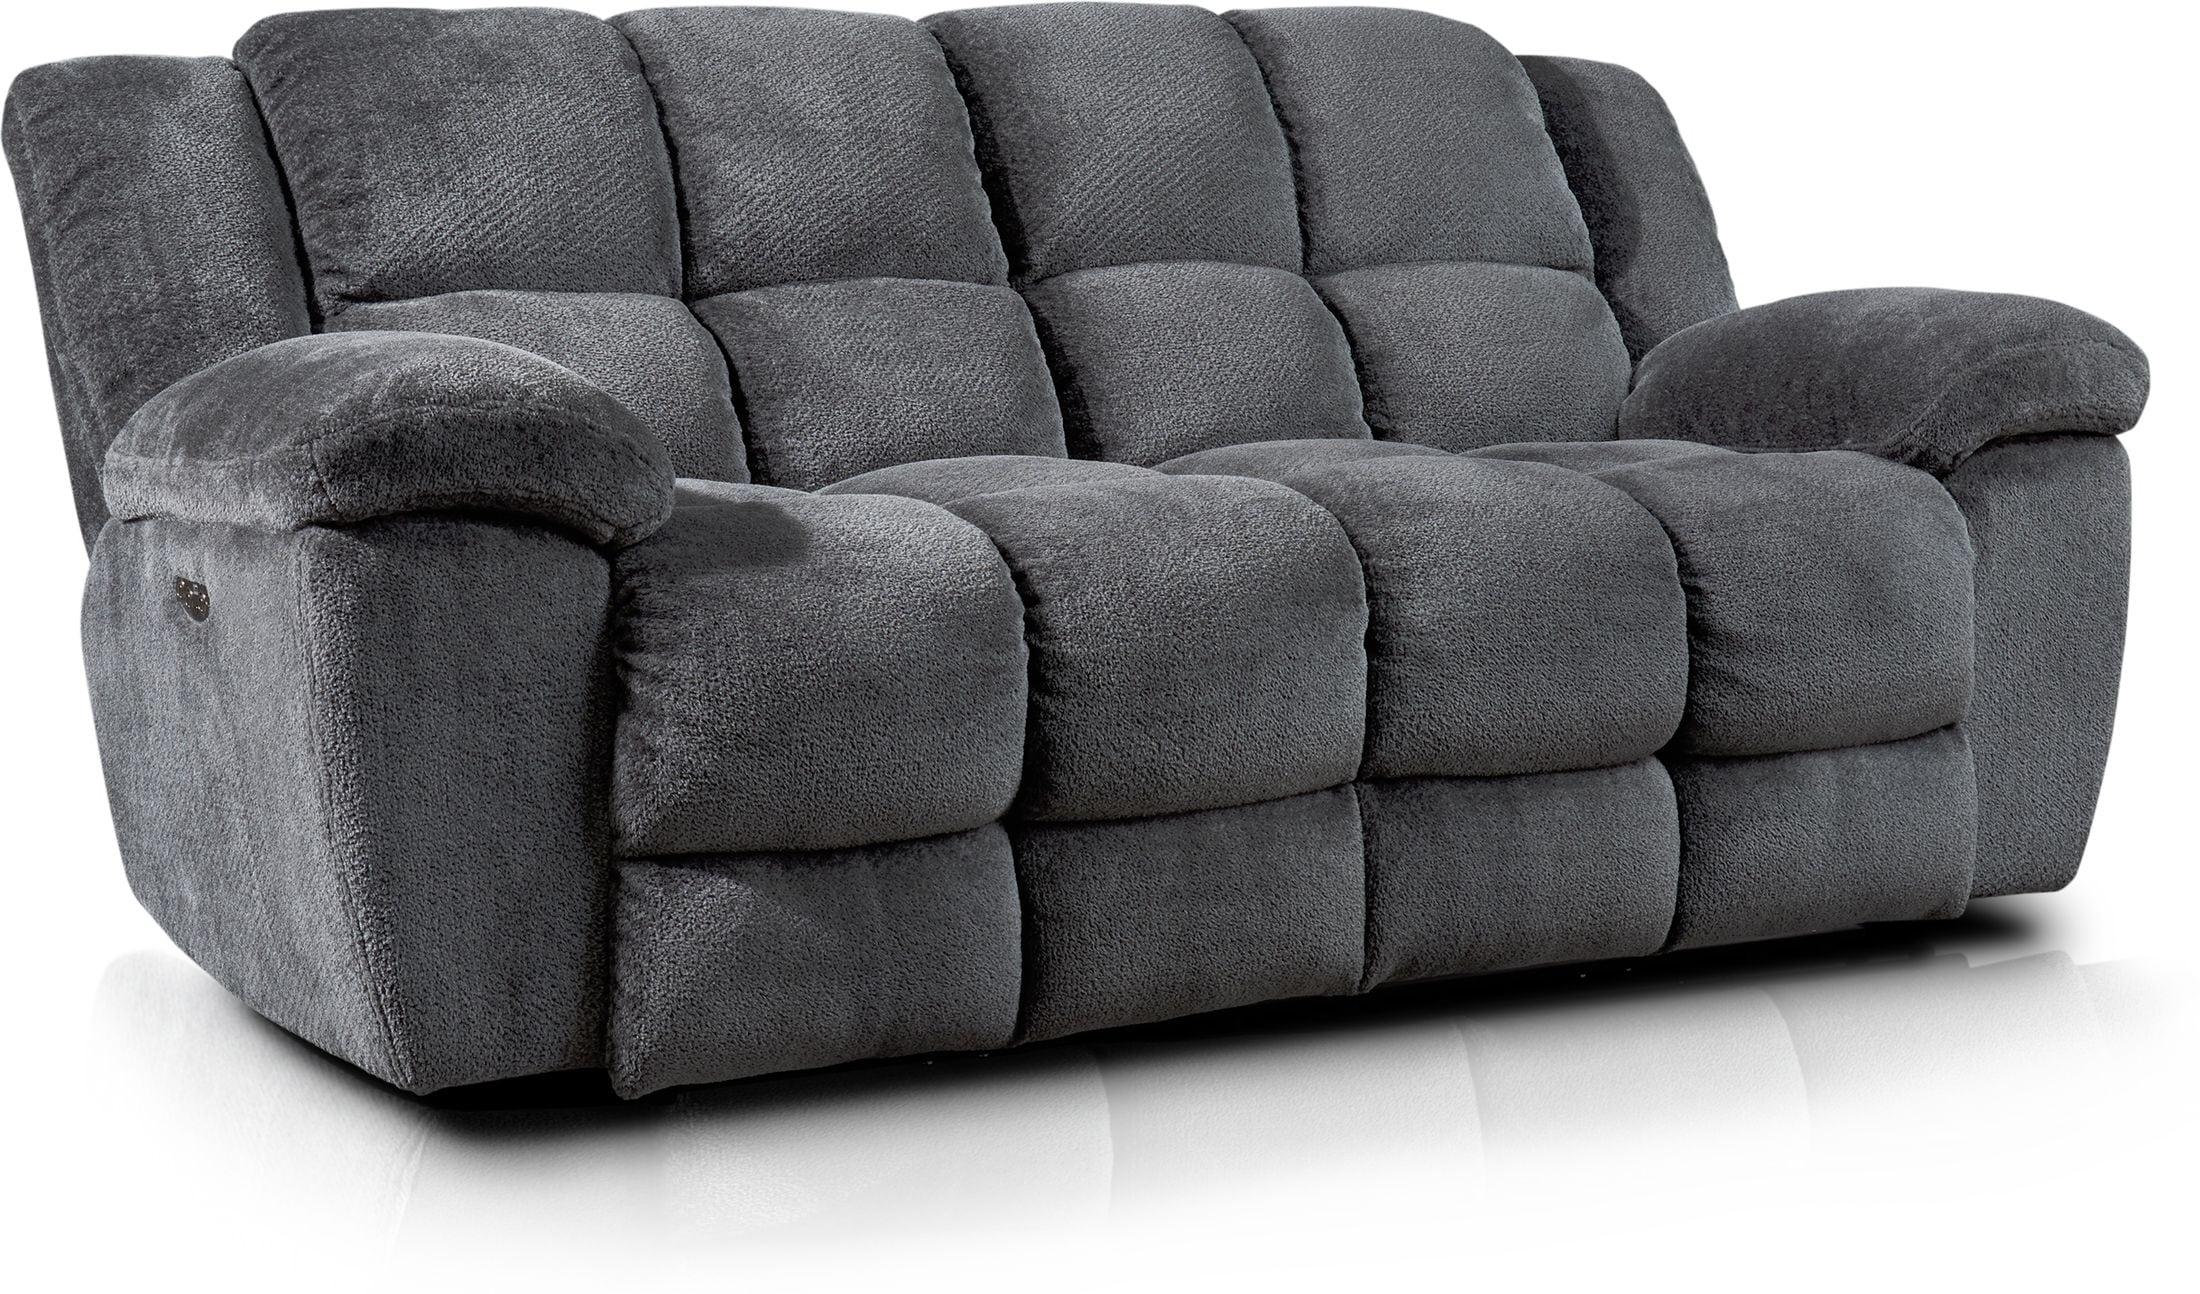 Living Room Furniture - Mellow Dual-Power Reclining Sofa - Gray